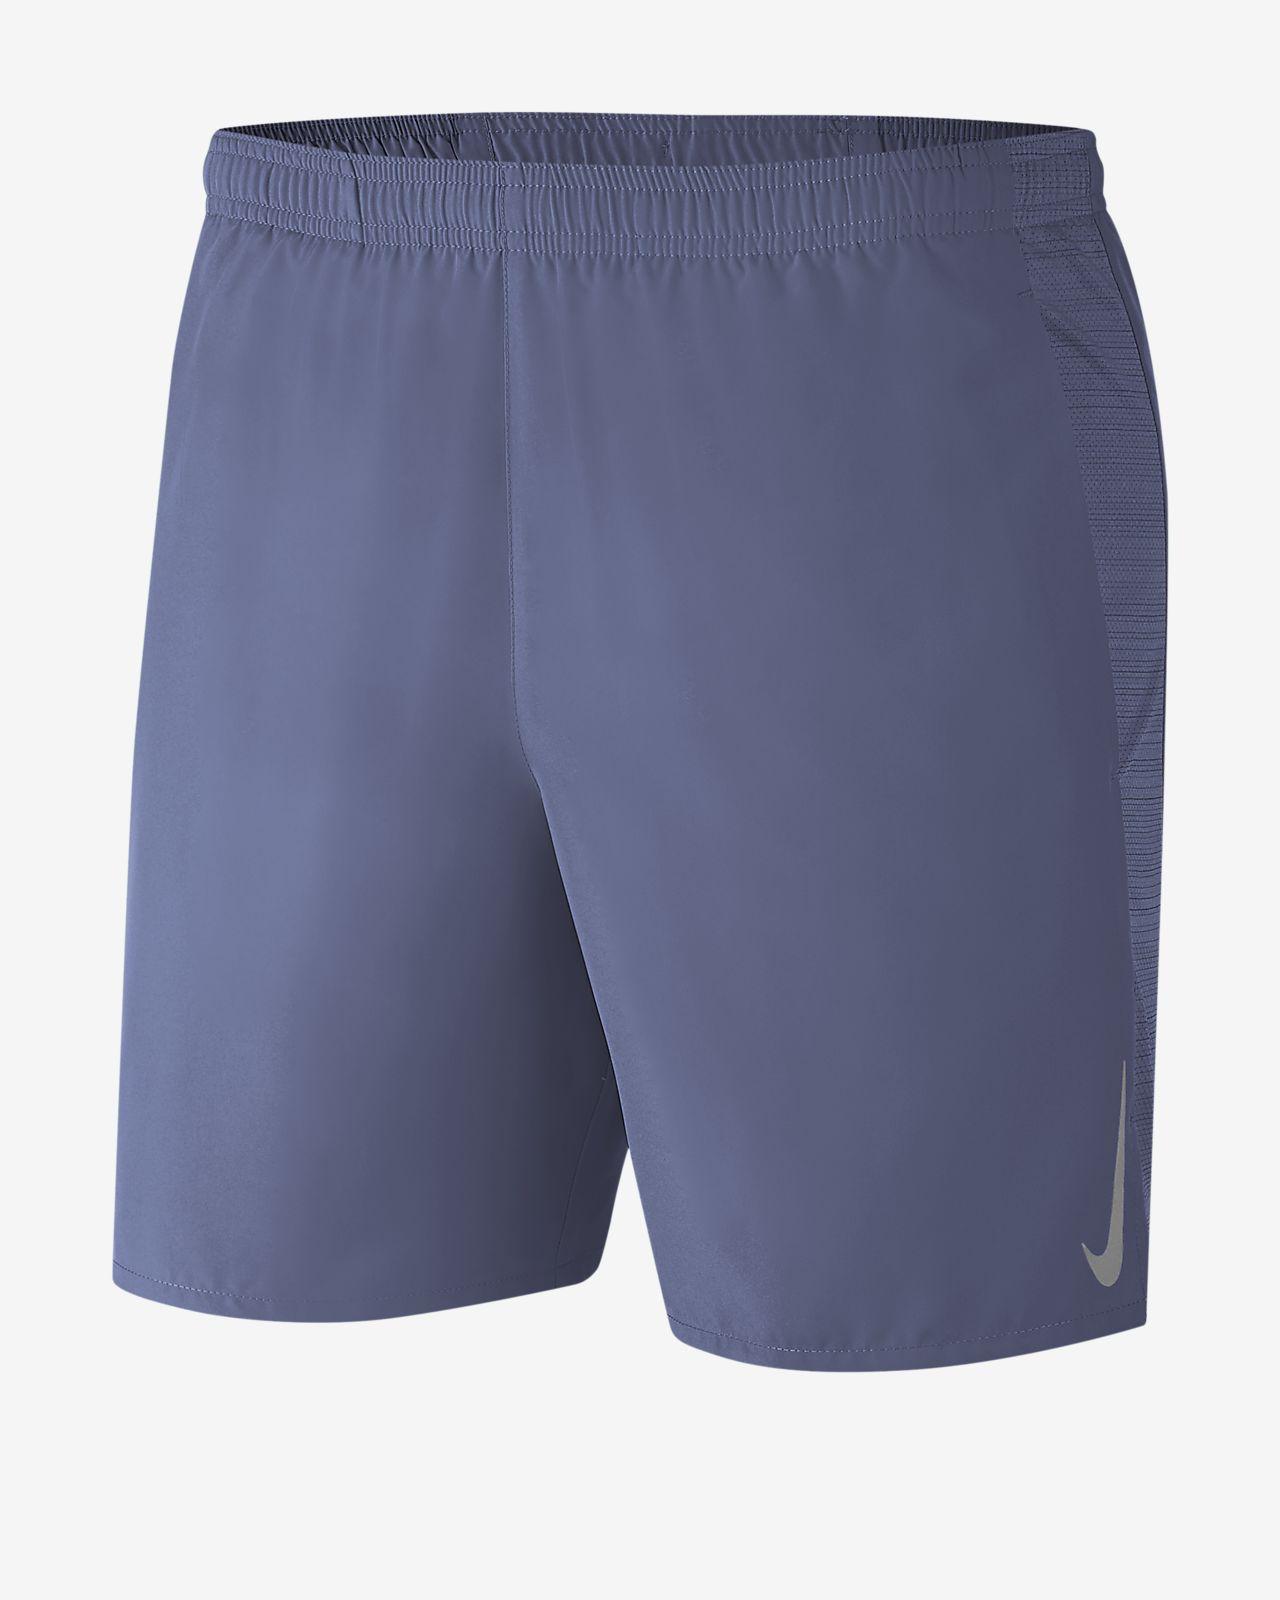 "Nike Challenger 男款 7"" 二合一跑步短褲"